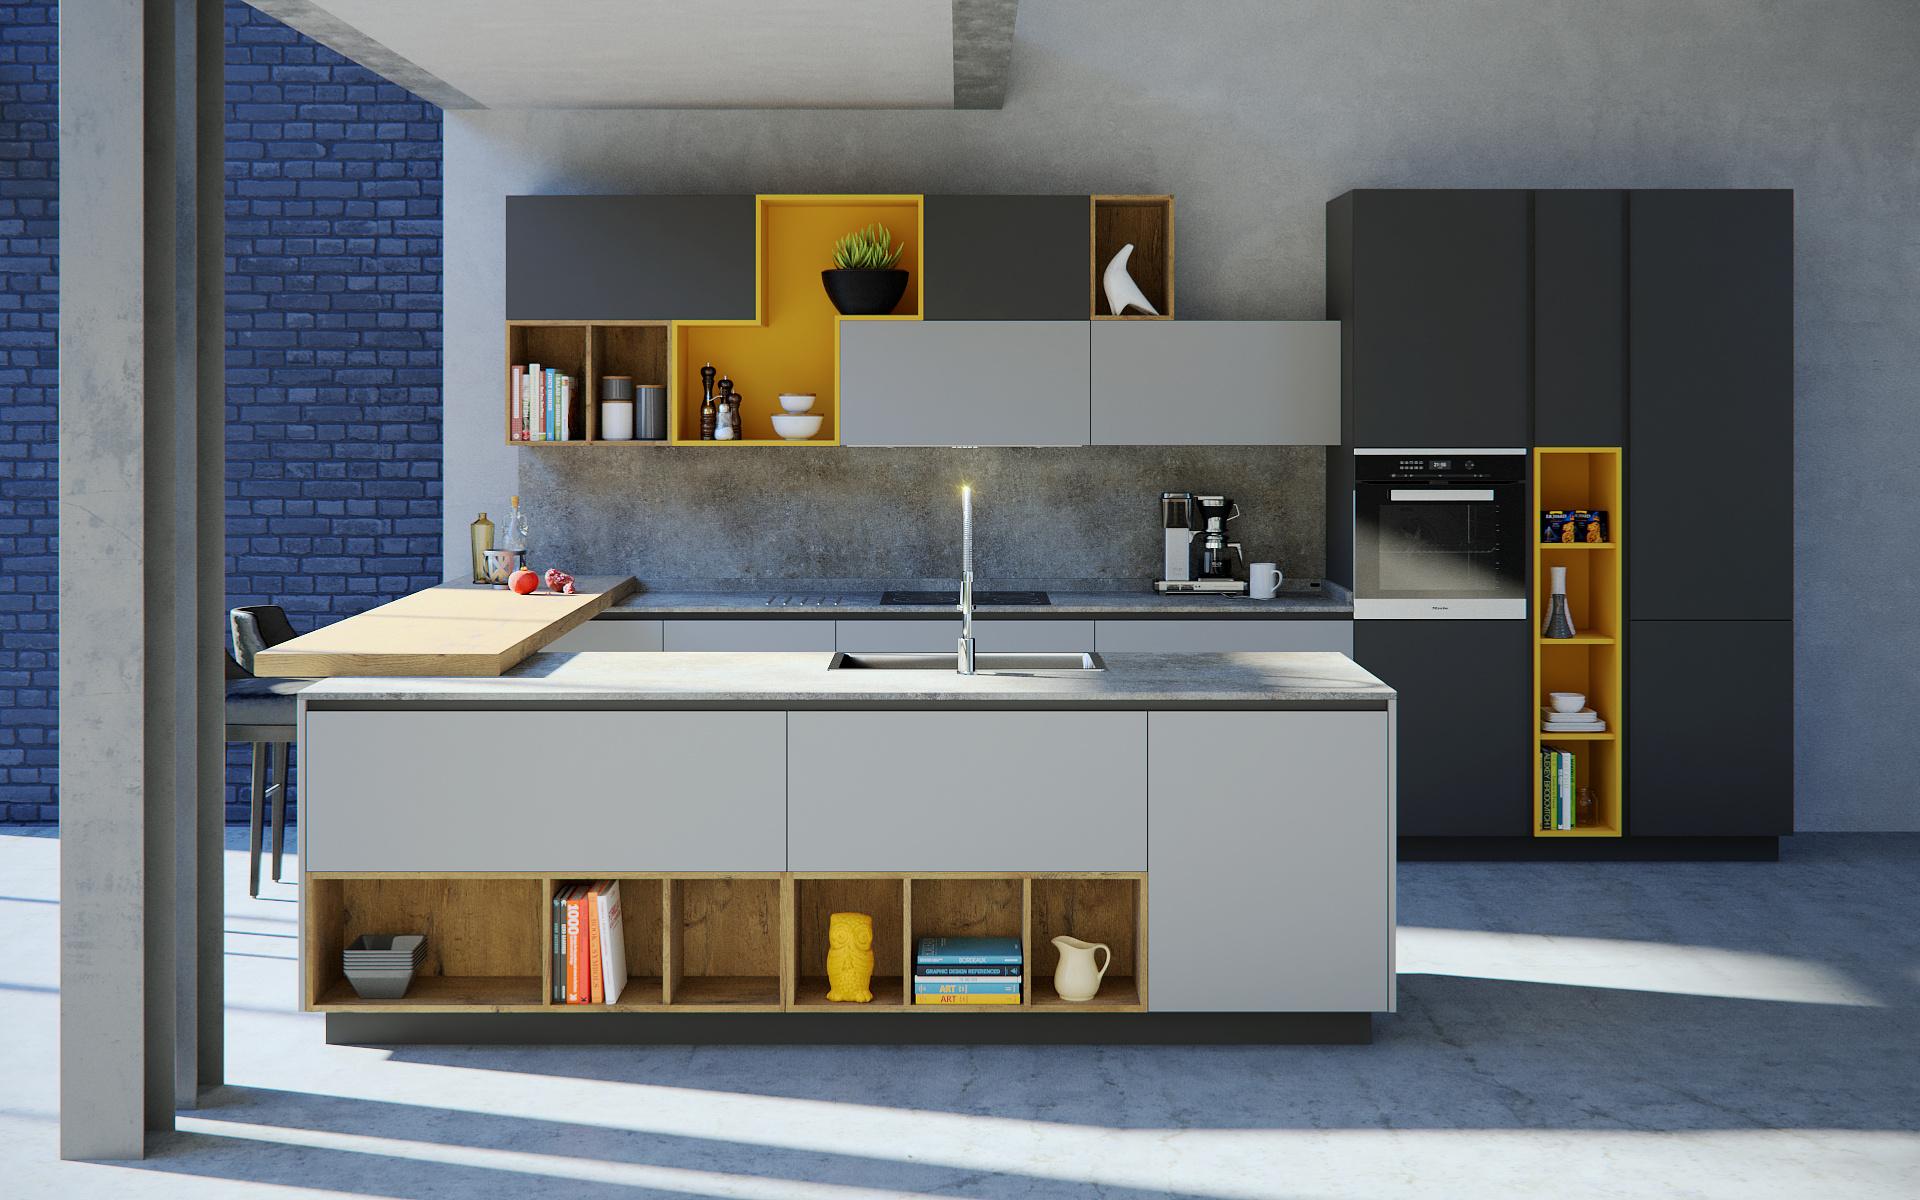 kober-cubiertas-cocina